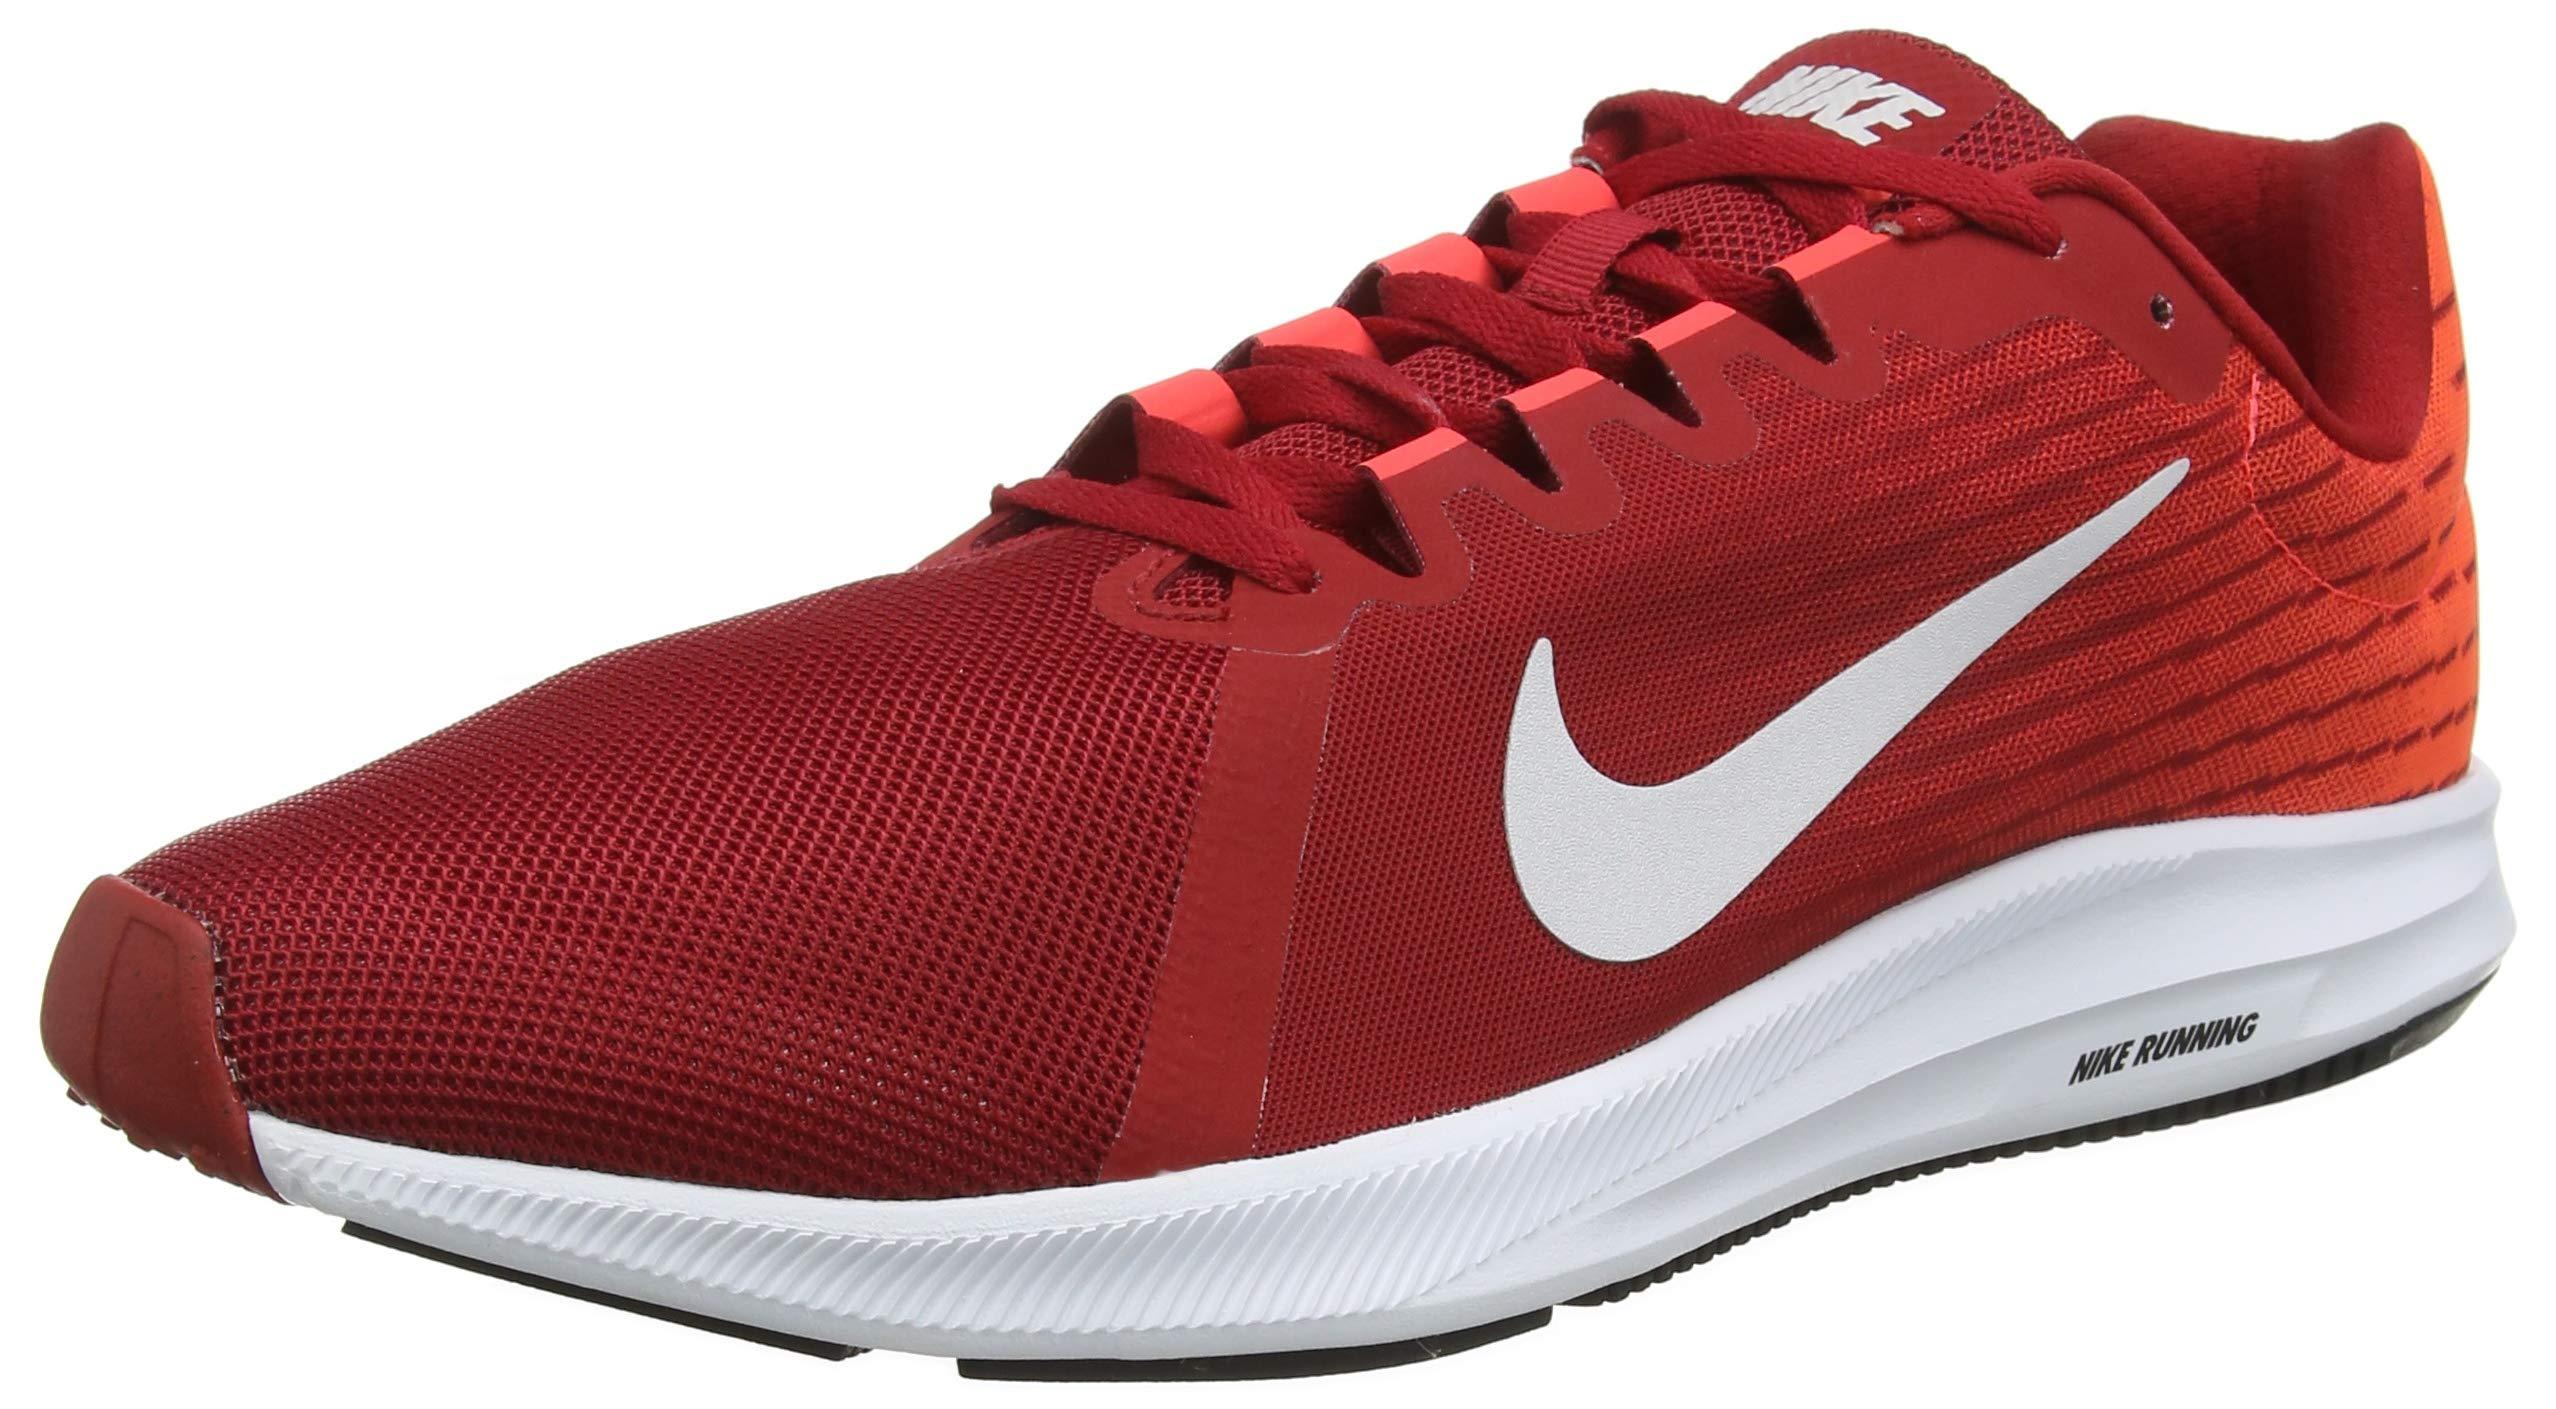 Nike Women's Downshifter 8 Sneaker Gym Red/Vast Grey/Bright Crimson 7.5 Regular US